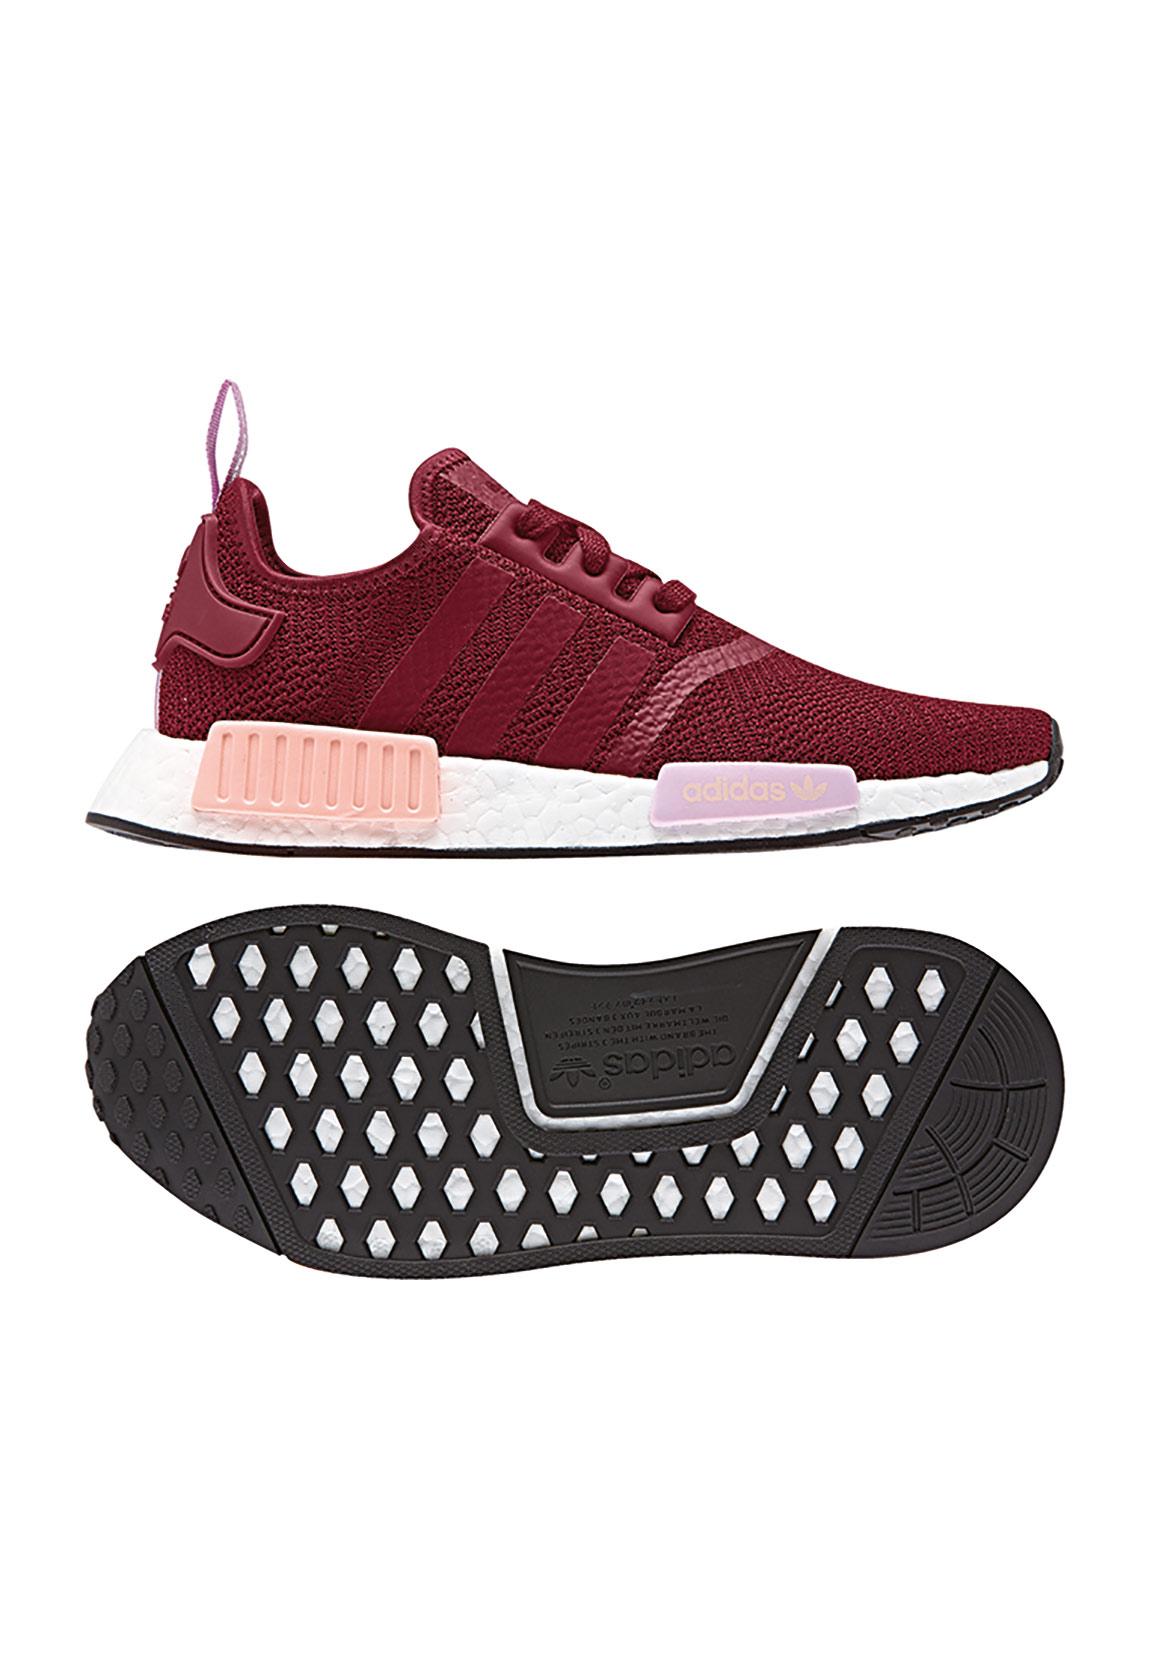 Adidas NMD R1 Originals ***NEU*** rot Sneaker Herren | Gr. 44 23